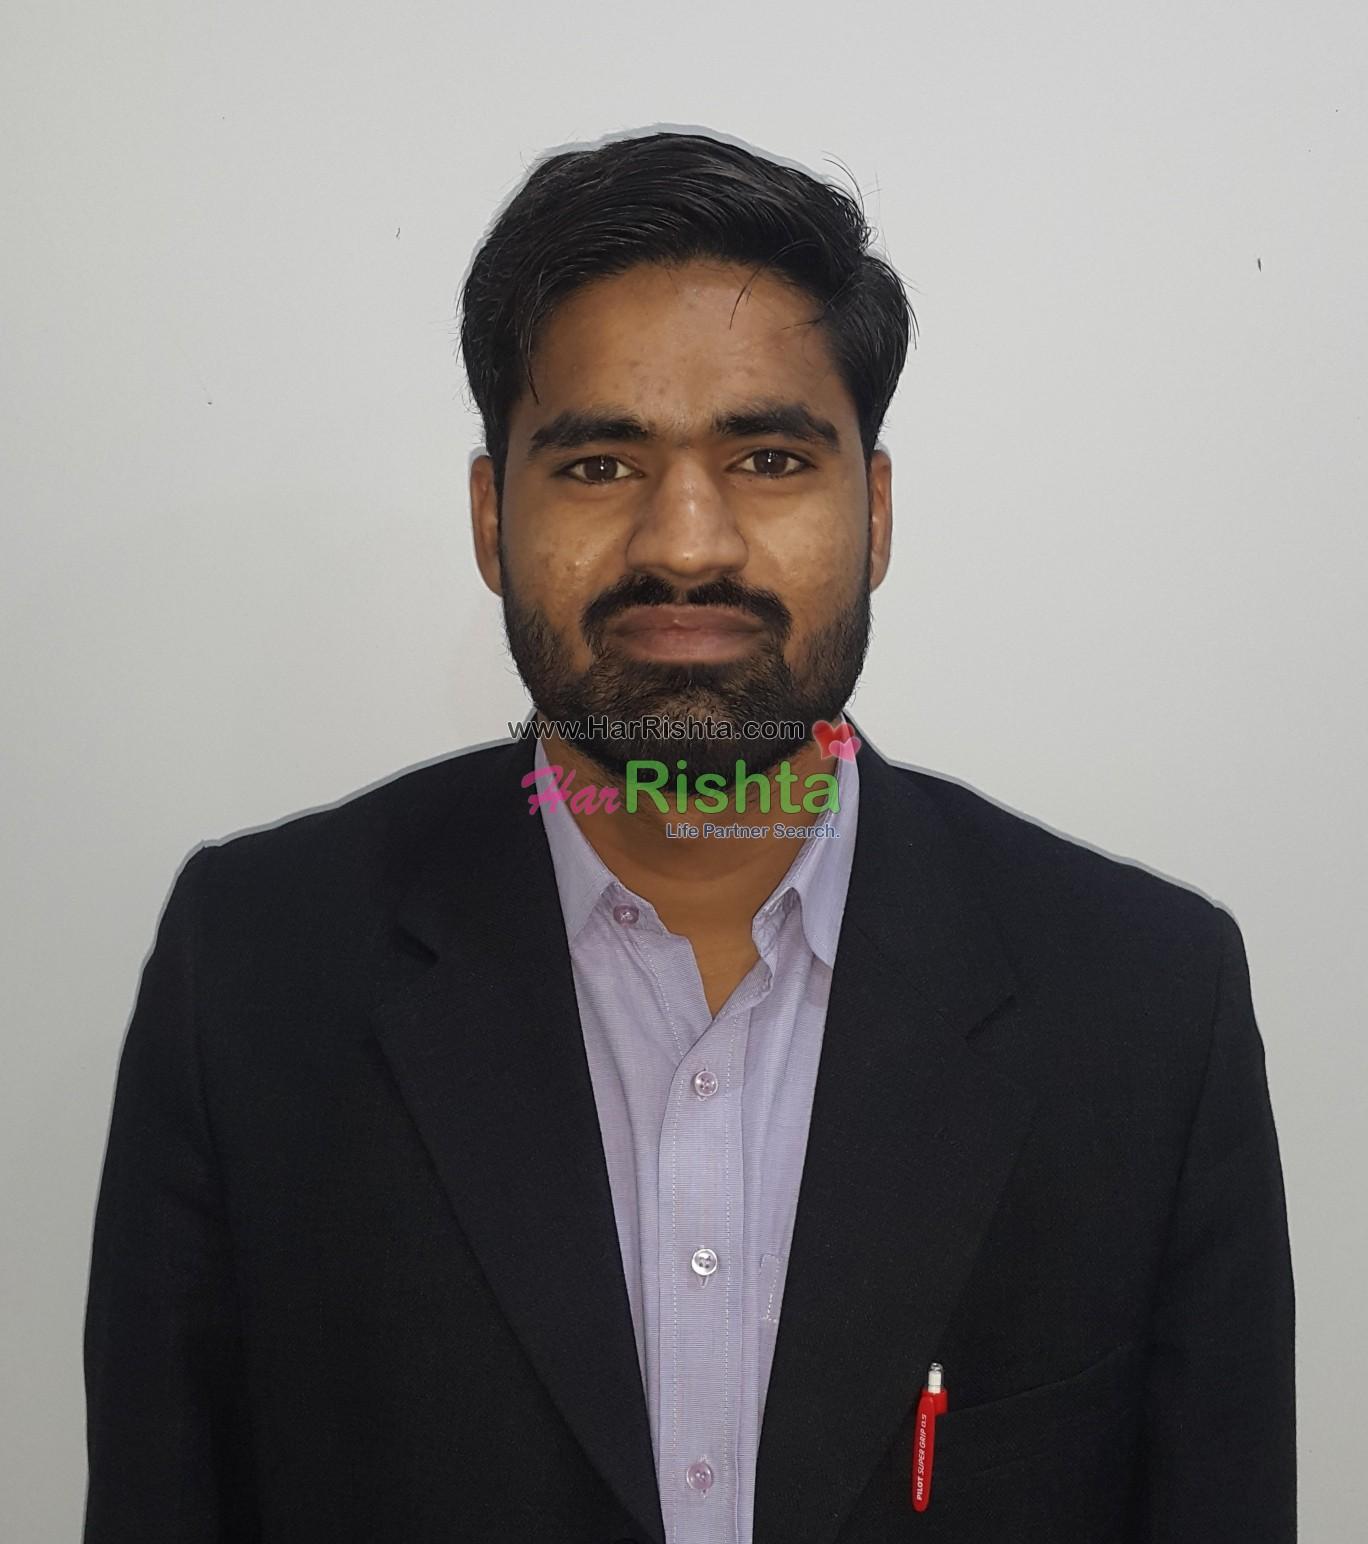 Bhatti Boy Rishta in Khairpur